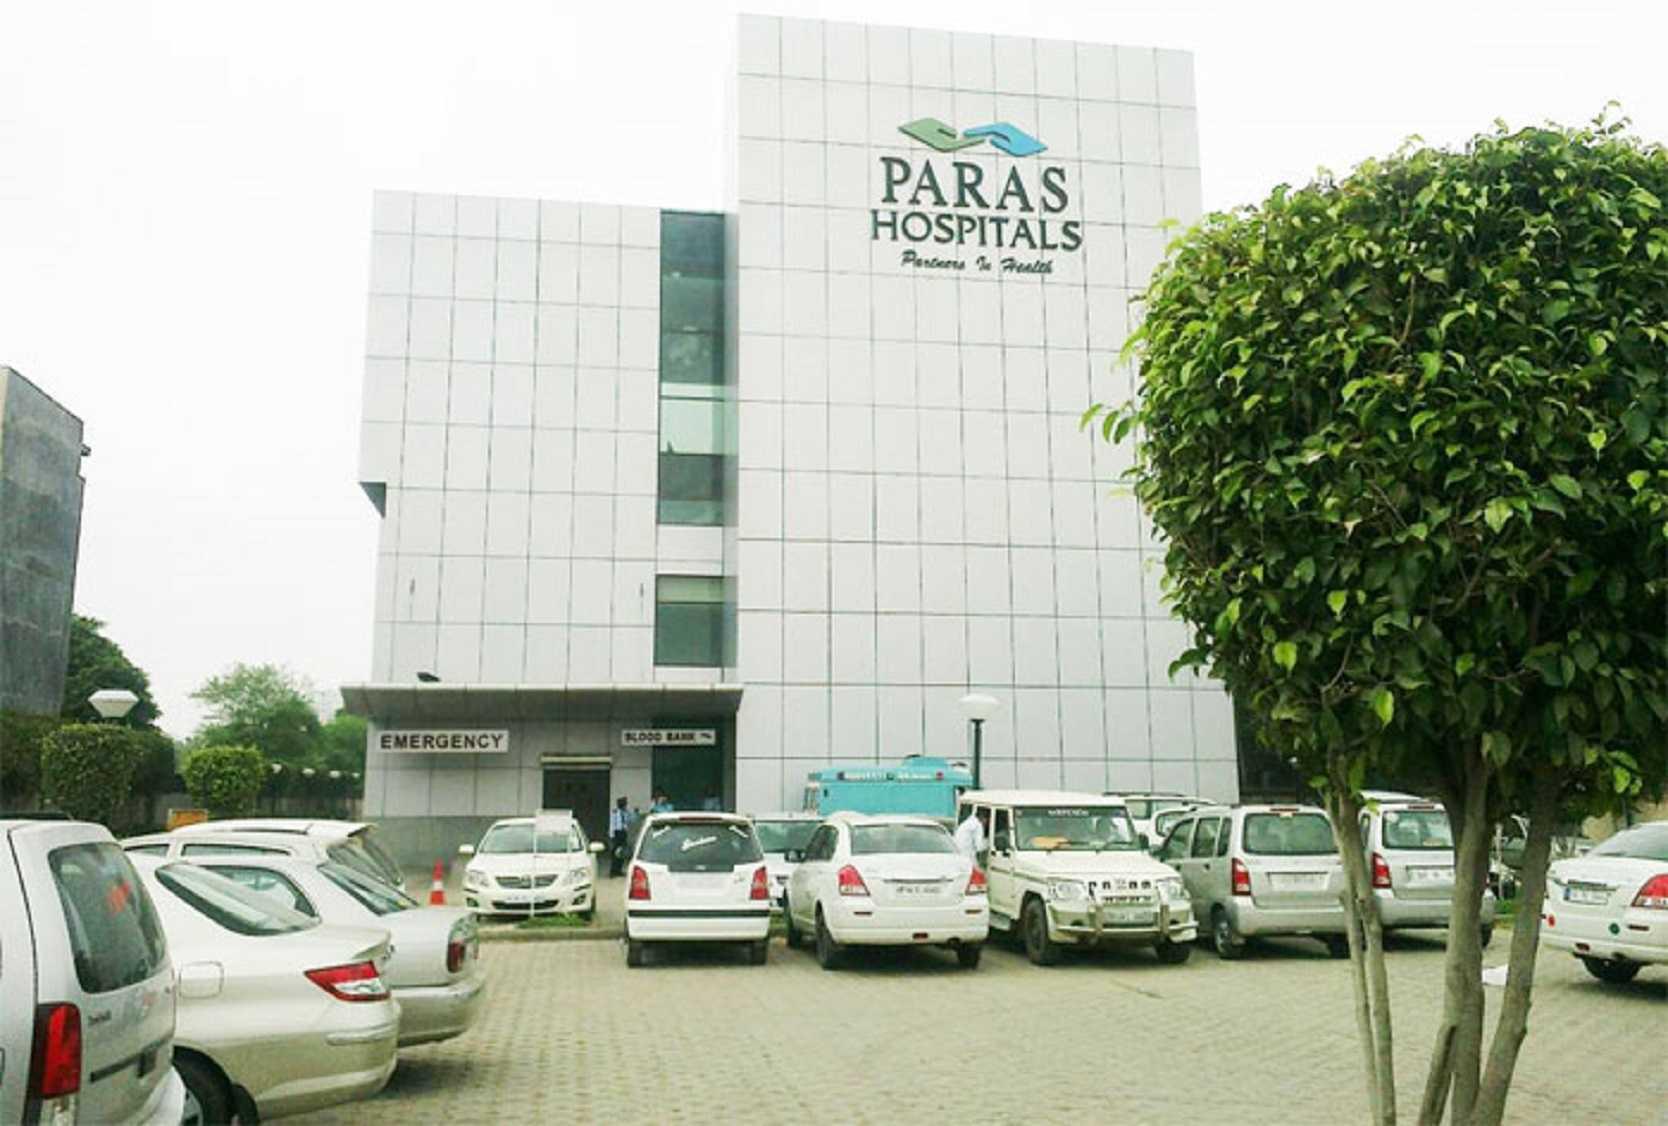 Paras hospitals gurgaon c06080